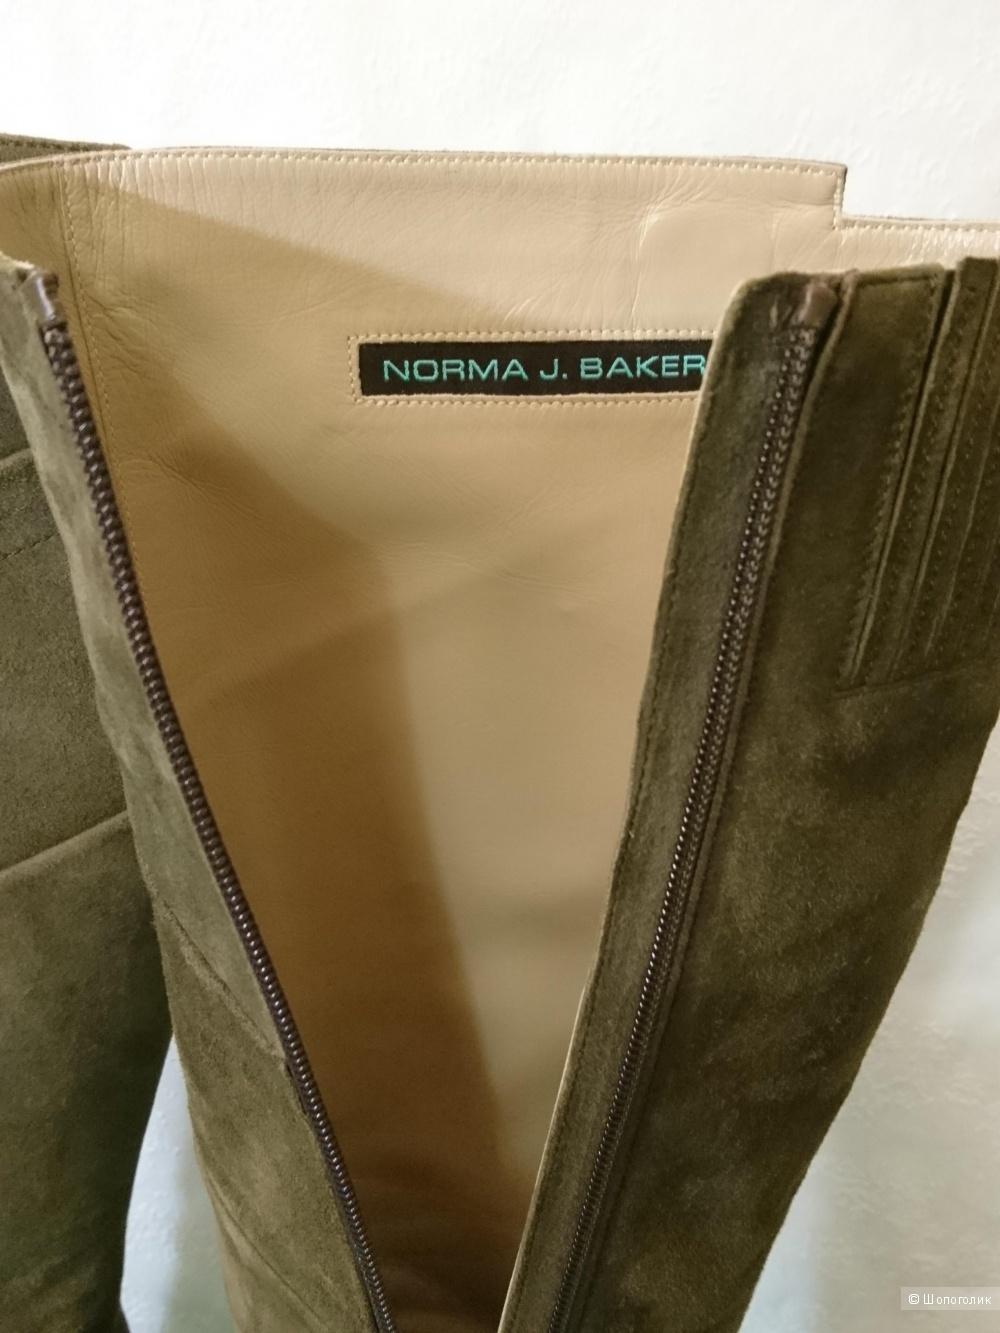 Сапоги итальянские Norma J. Baker,37 размер